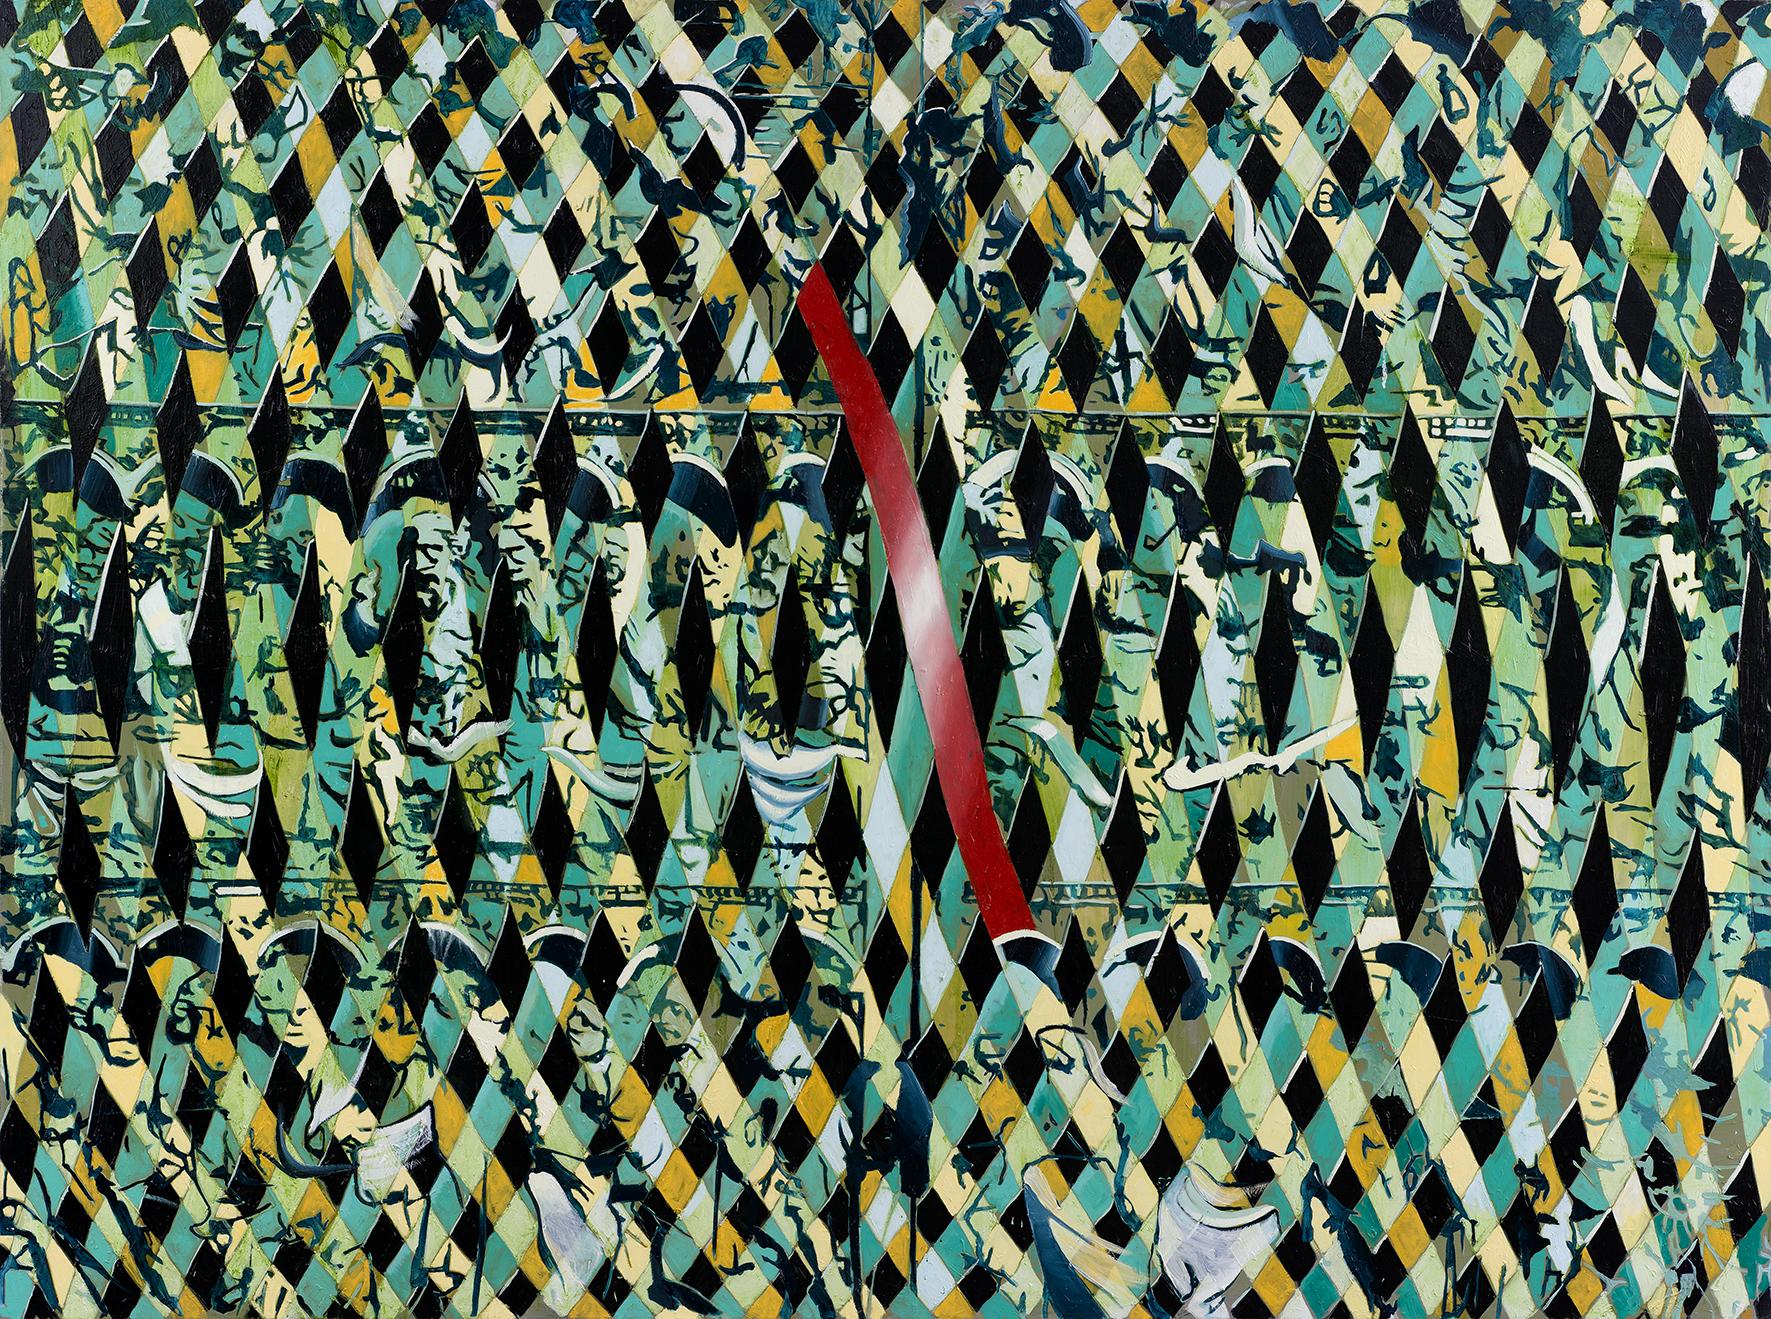 Oren Eliav, Procession, 2014, oil on canvas , 200 x 270 cm